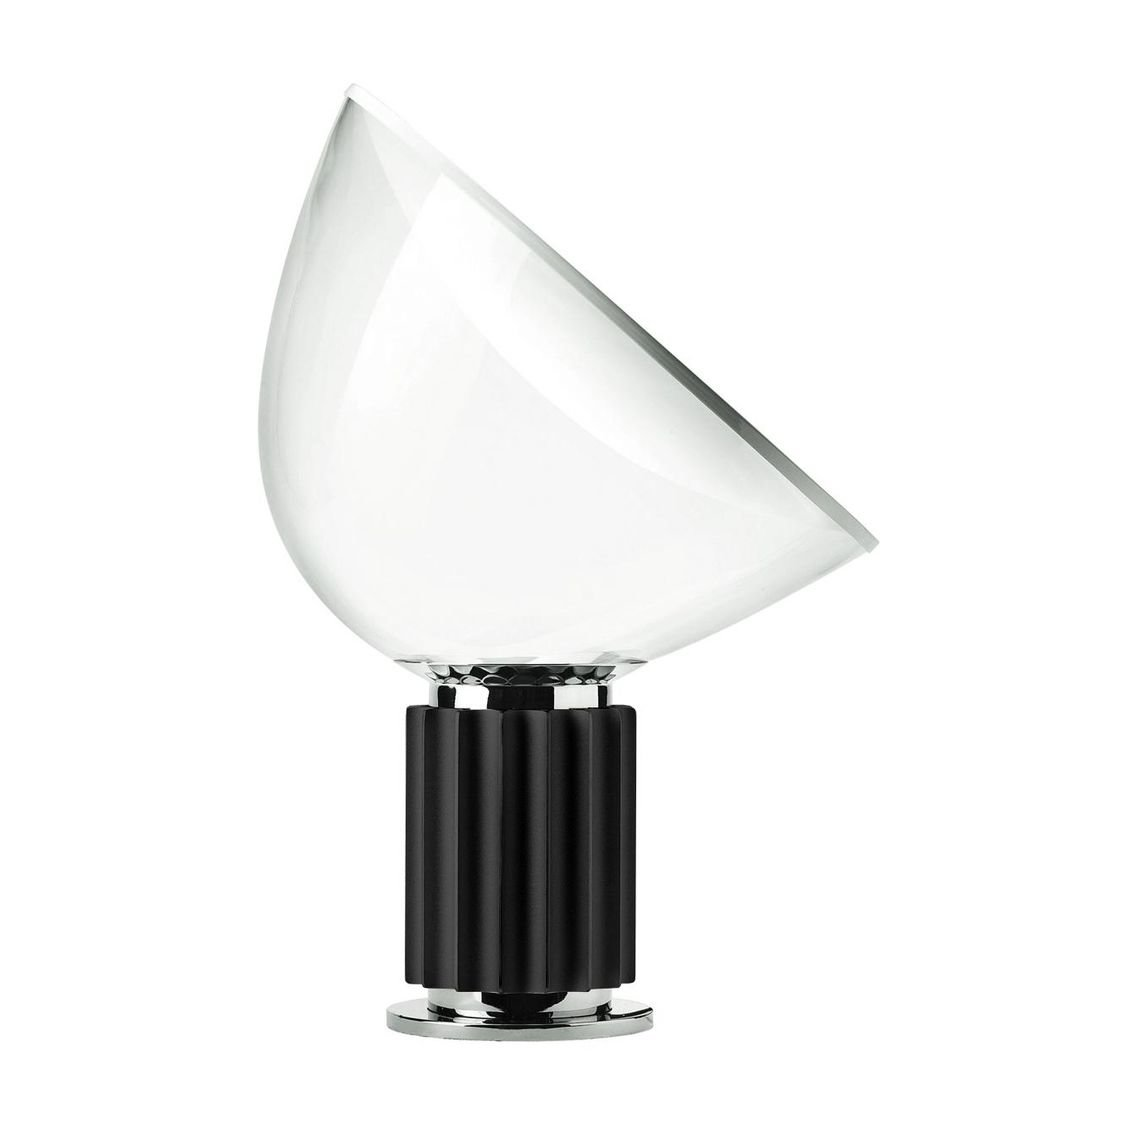 Taccia led table lamp flos ambientedirect taccia led table lamp aloadofball Images